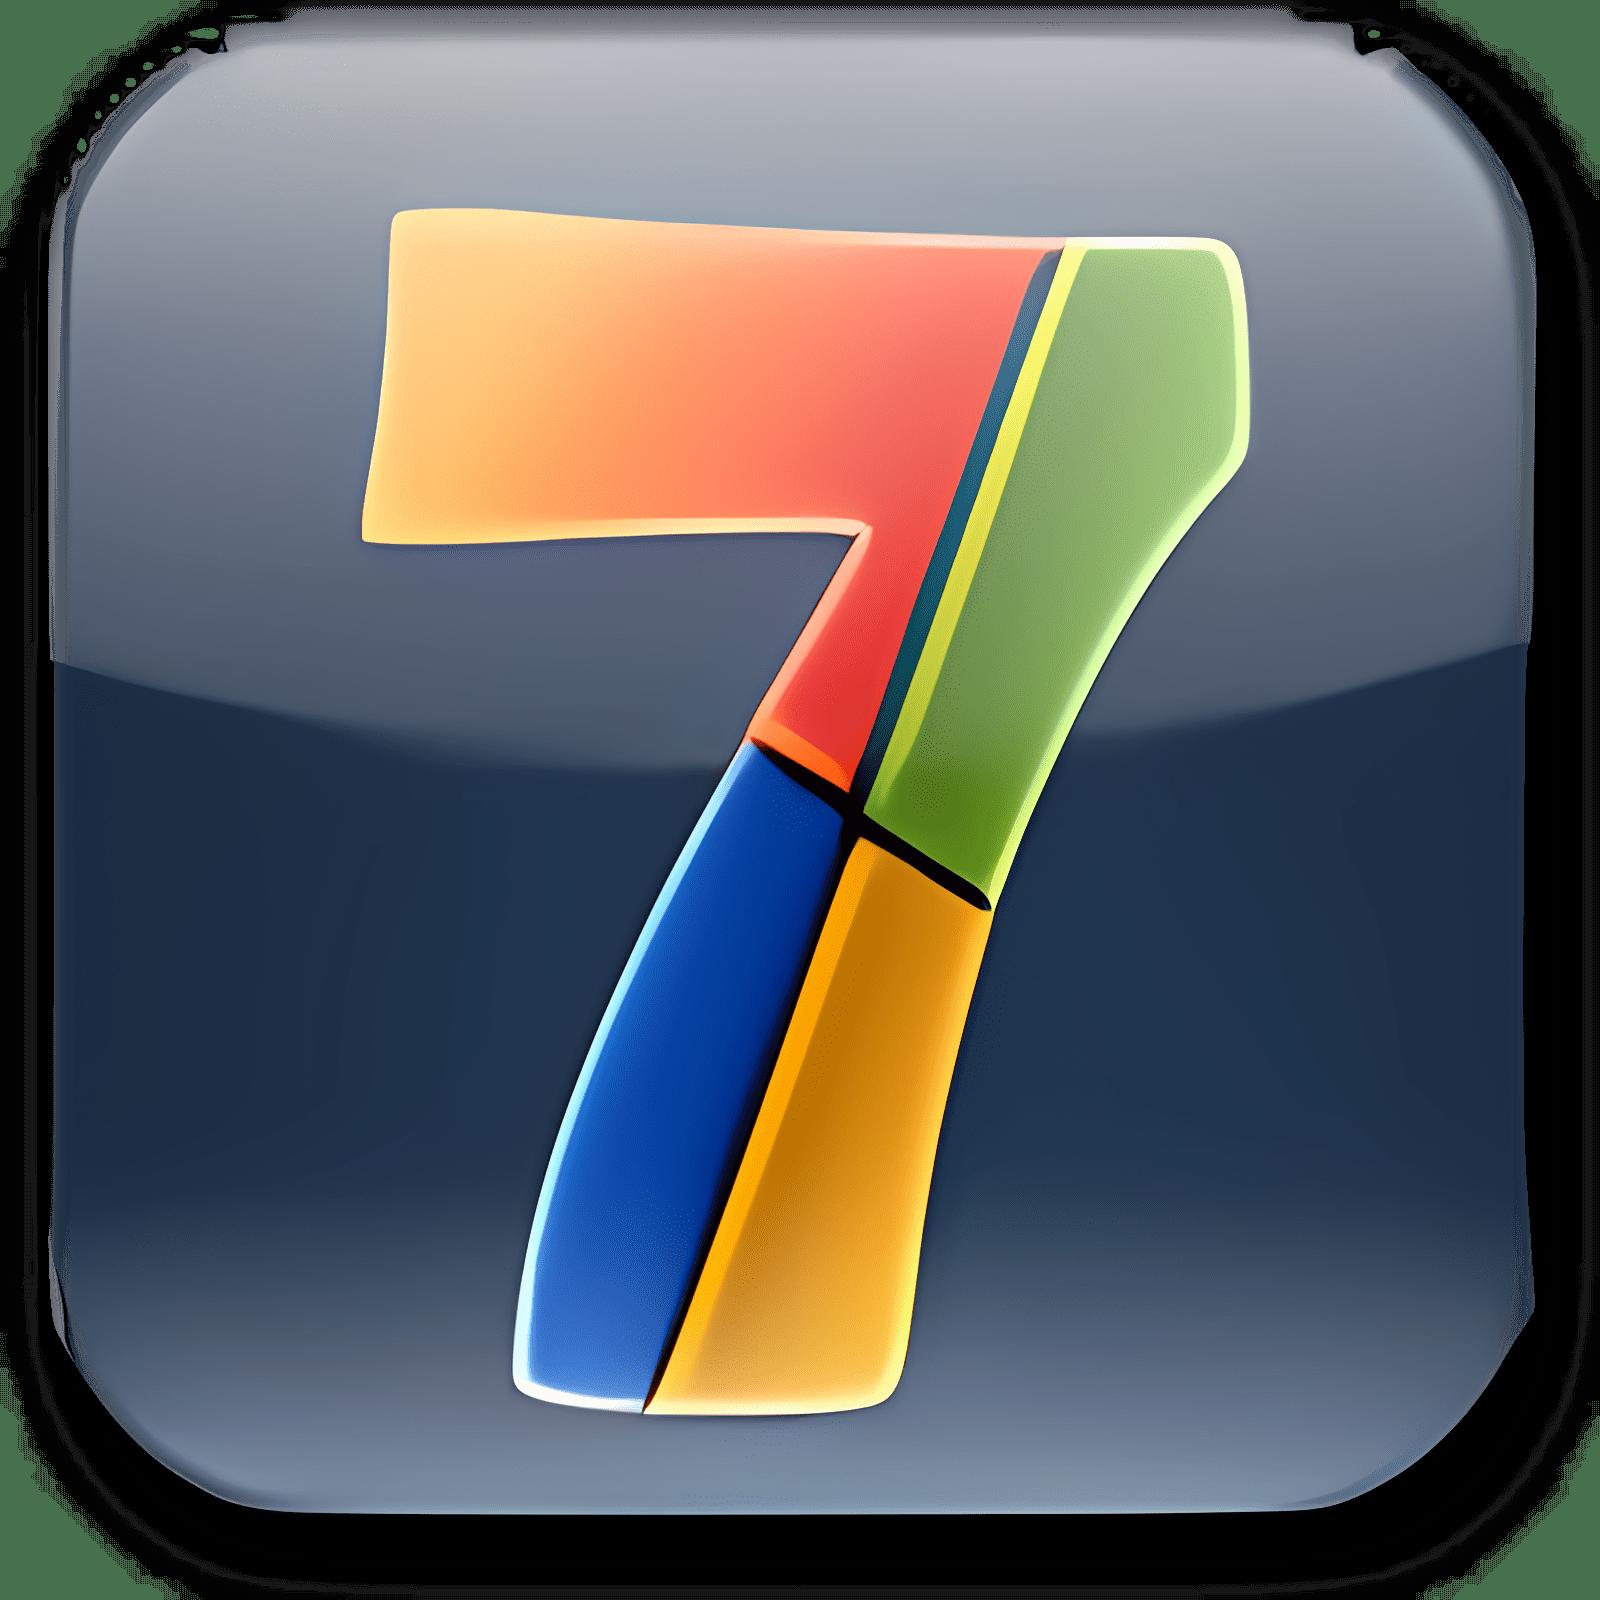 Windows 7 Wallpaper Pack